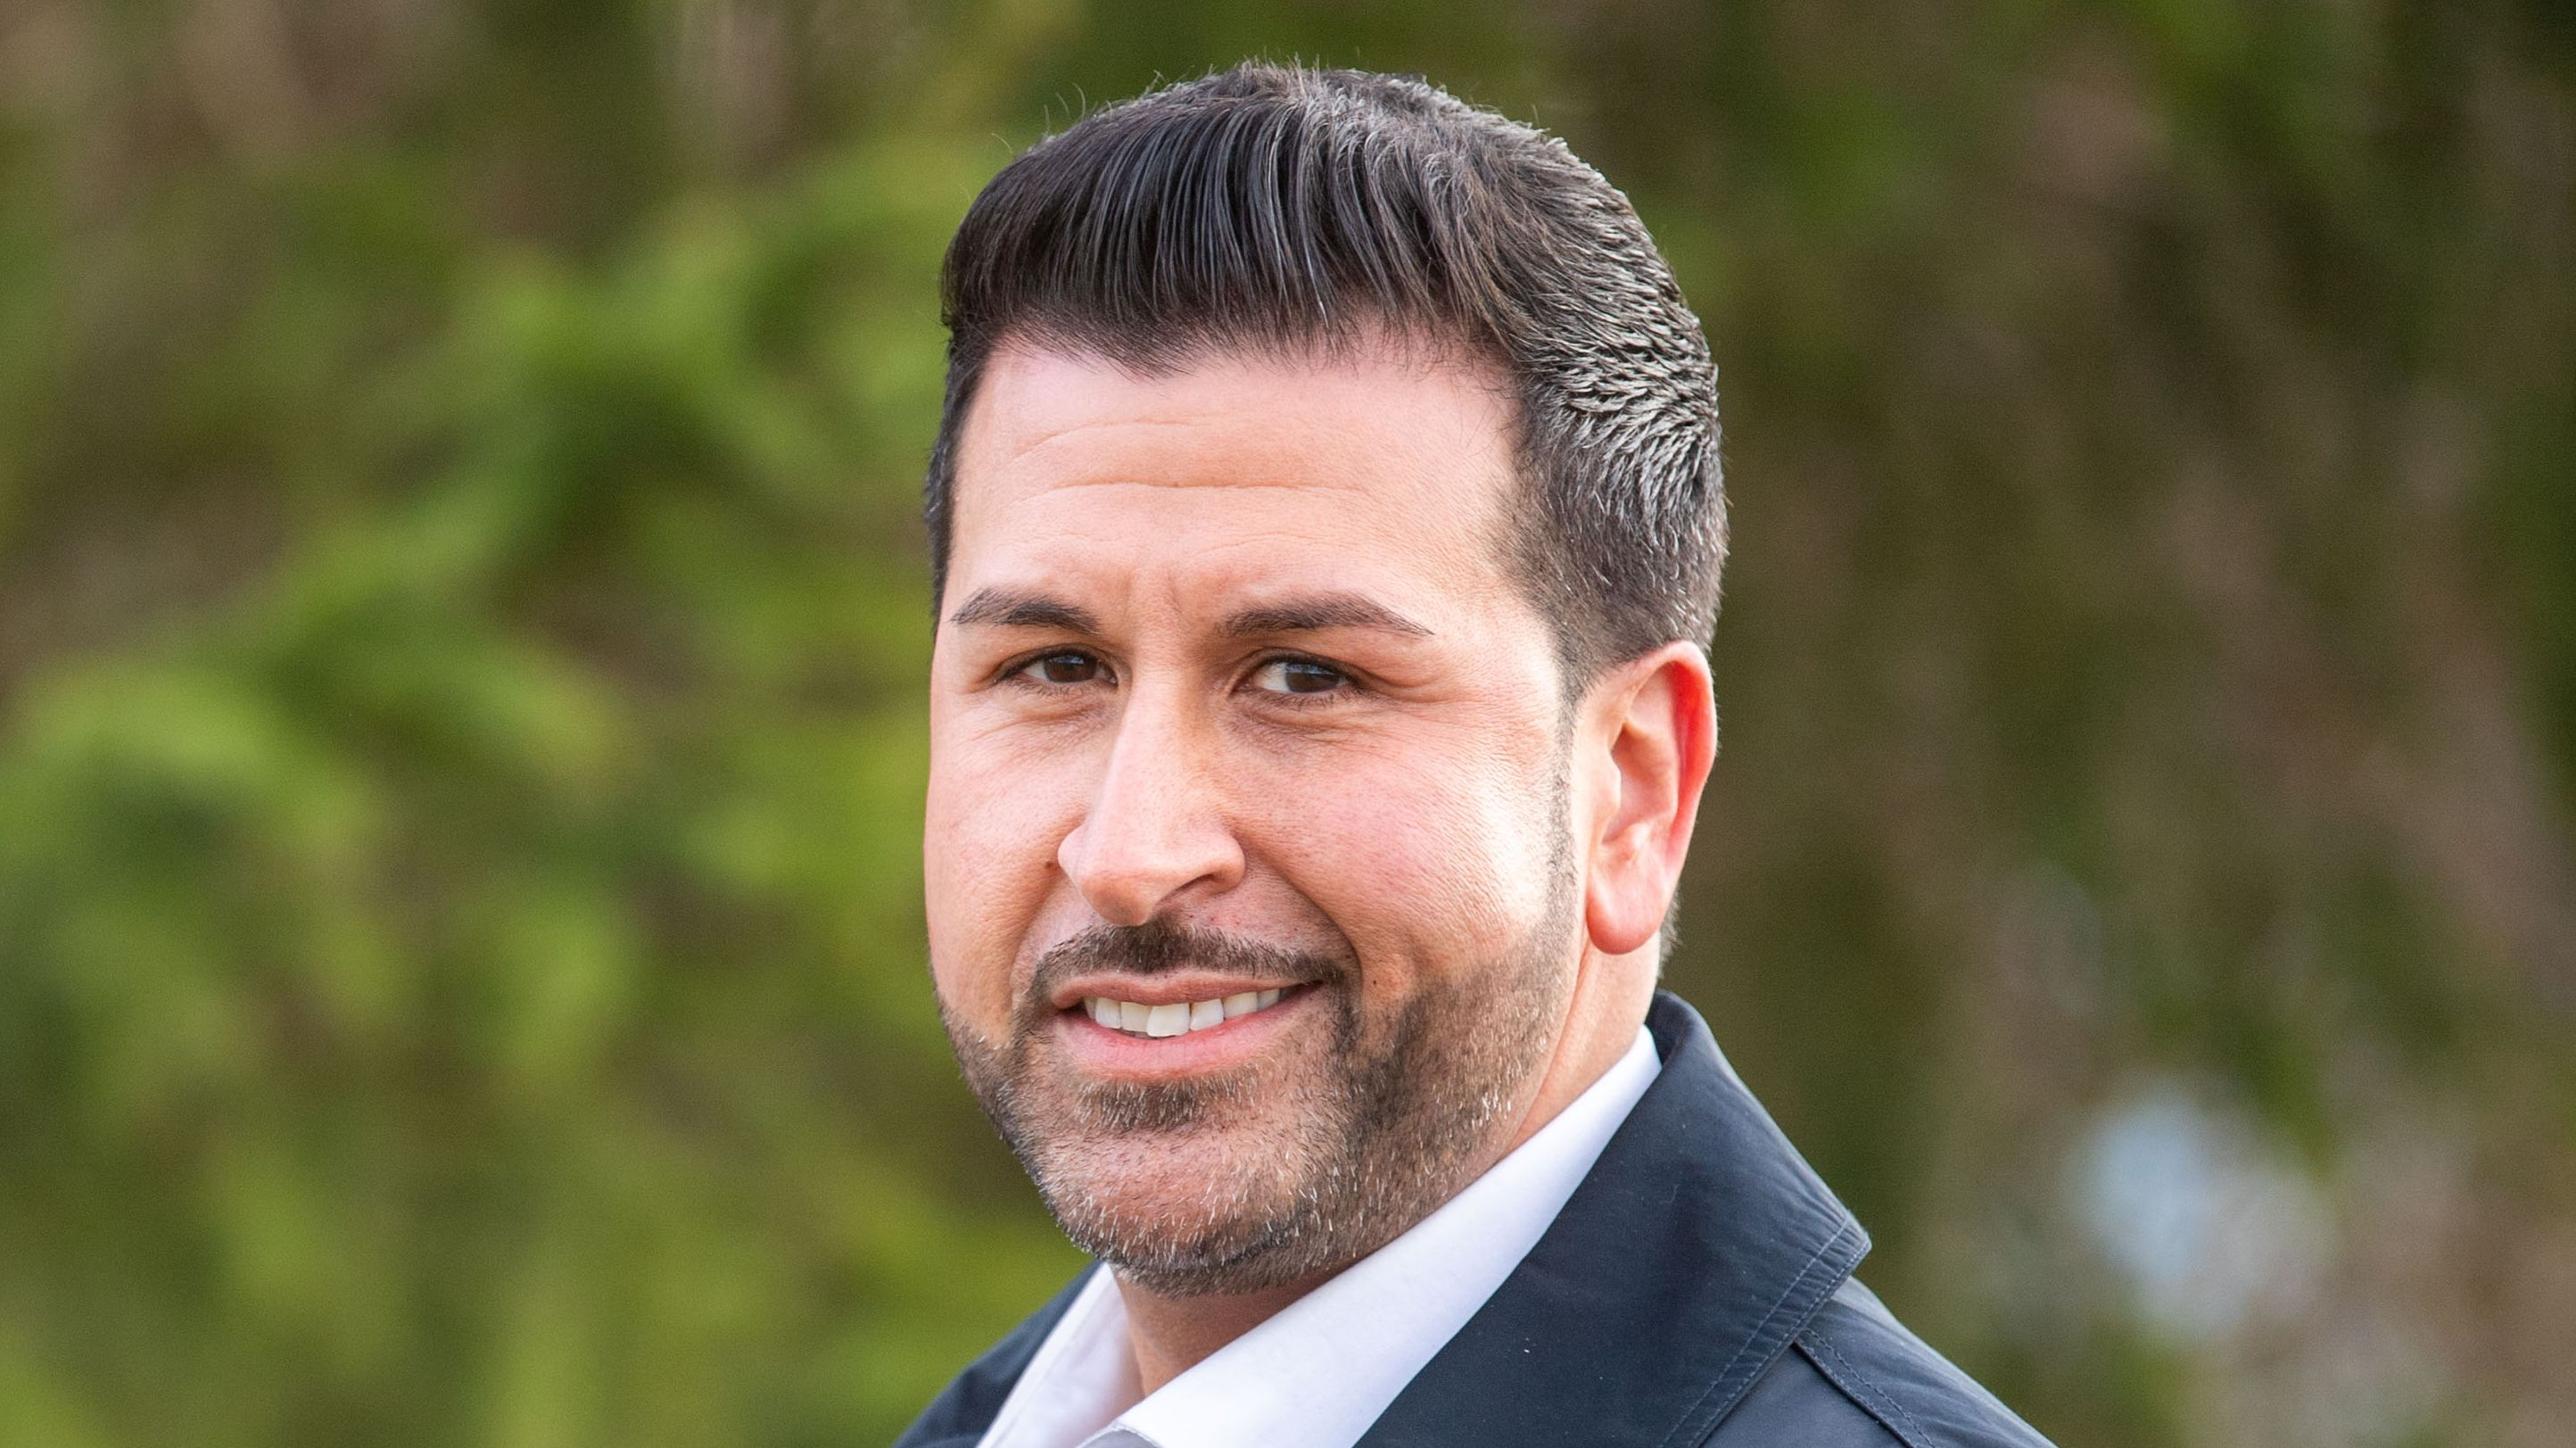 Ozan Iyibas, türkischstämmiger Bürgermeisterkandidat in Neufahrn bei Freising